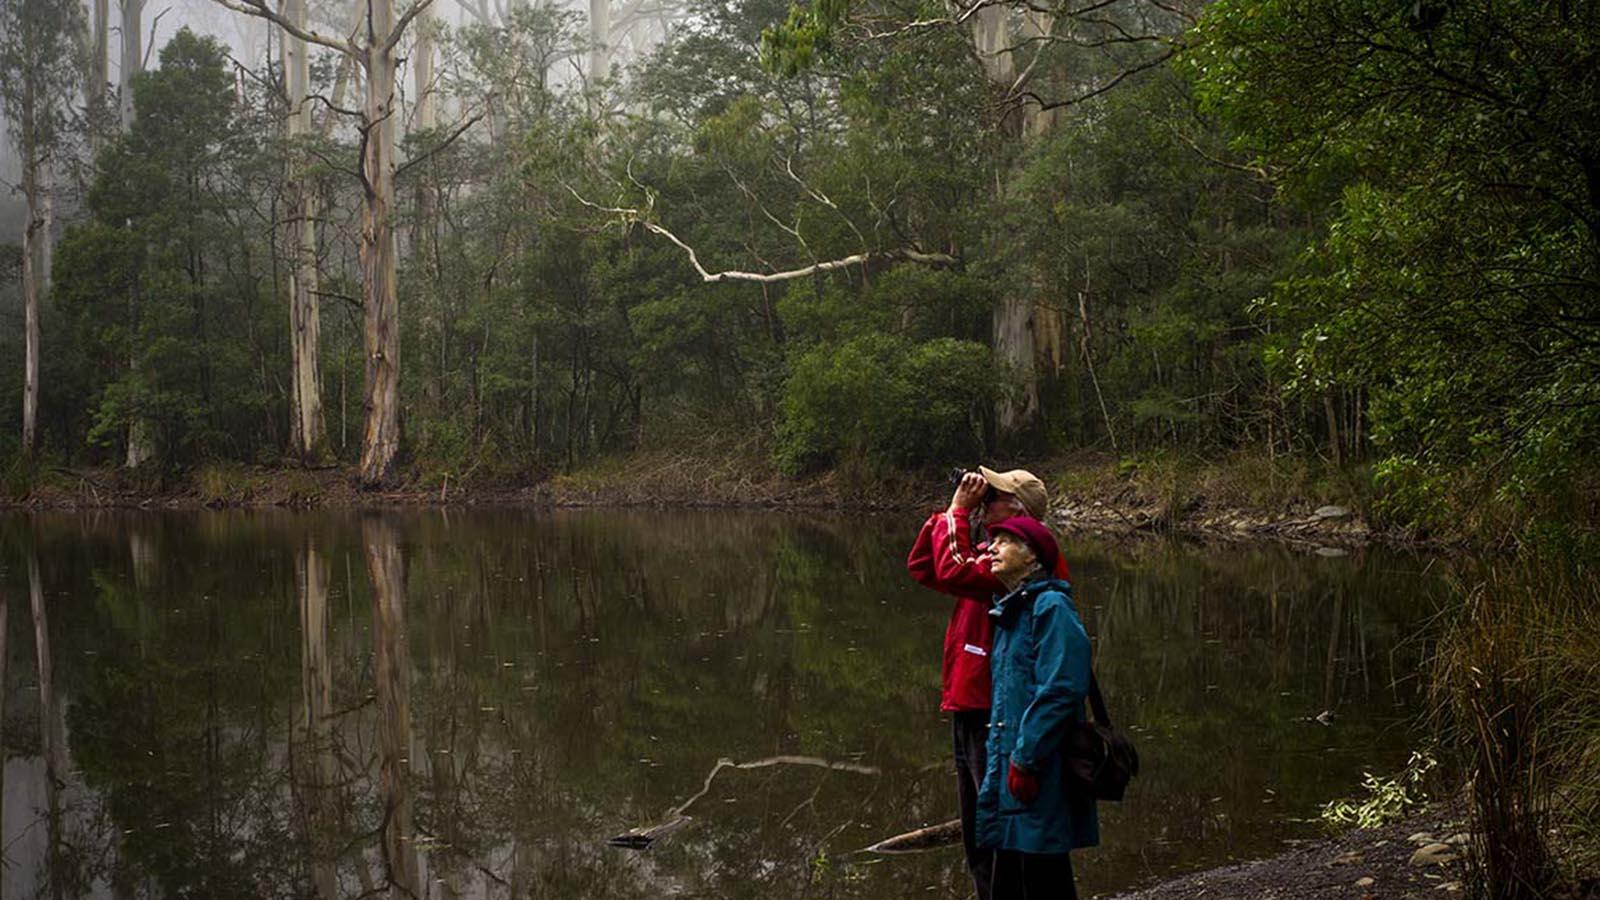 Mt Macedon walkers, Daylesford and the Macedon Ranges, Victoria, Australia